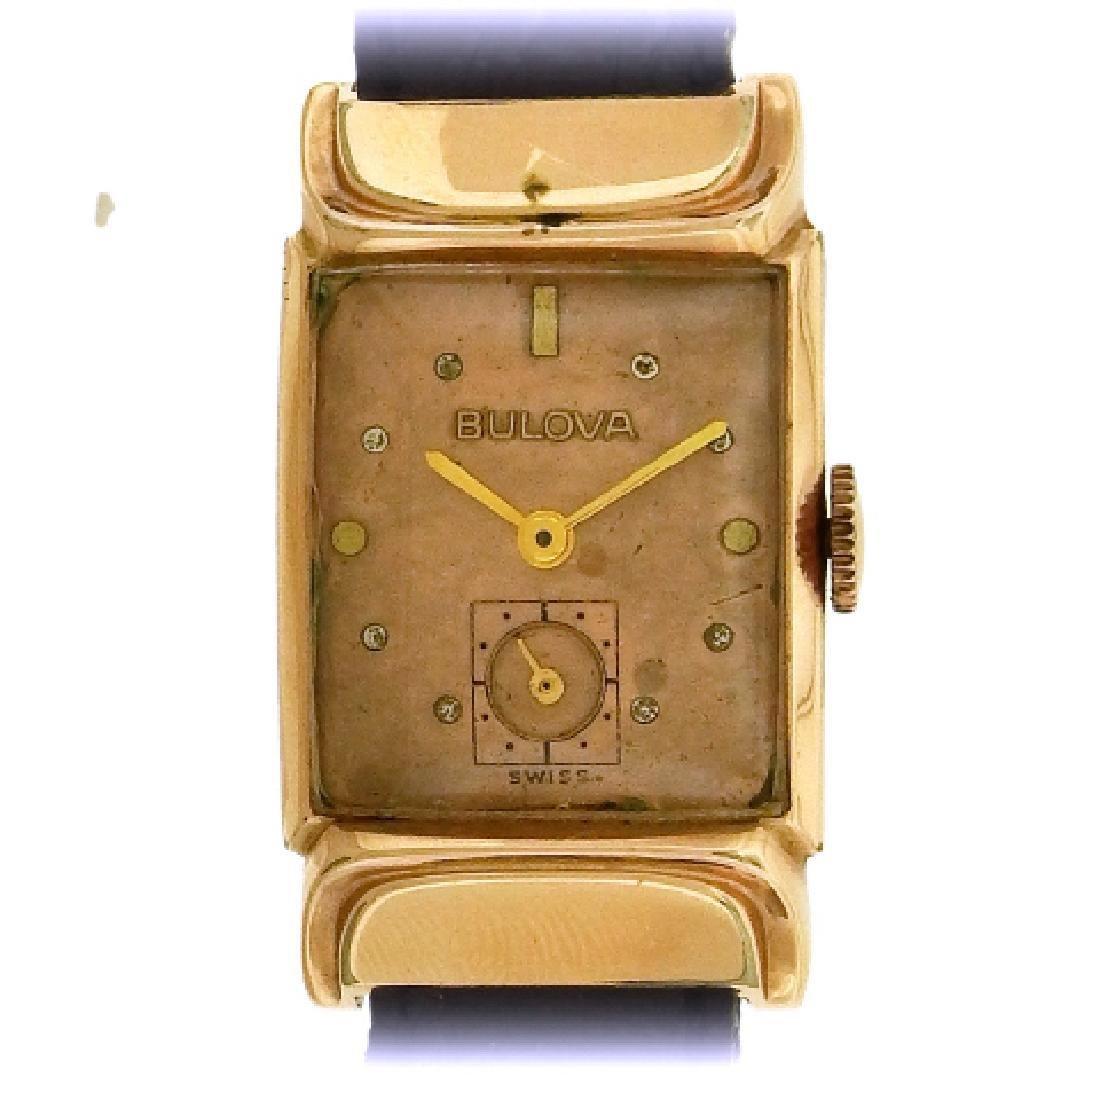 Bulova C 1940 Art Deco Rose Gold Watch